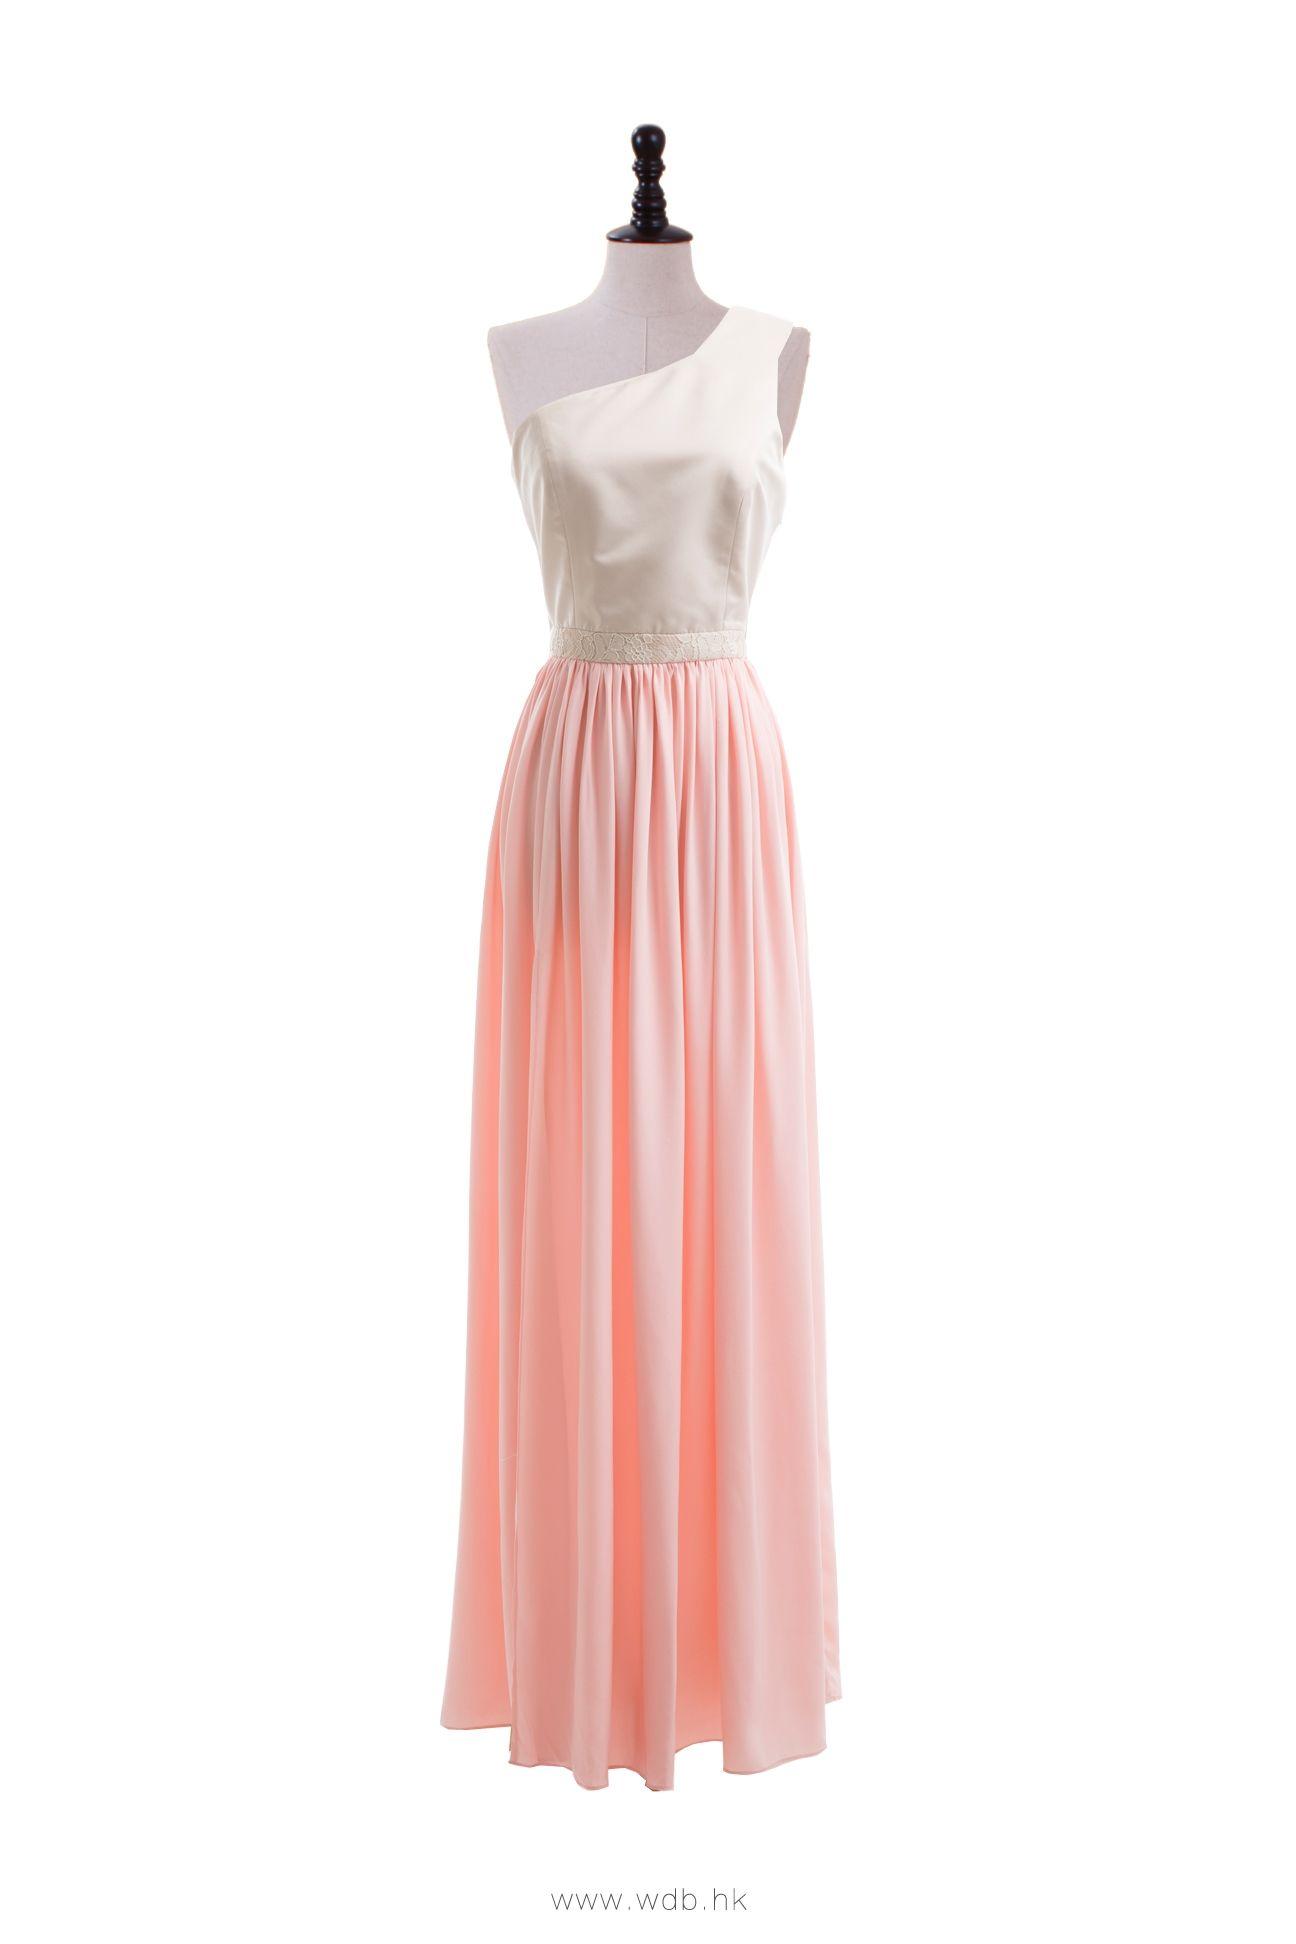 One shoulder floor length bridemaids dress $124.98 | Bridesmaids ...